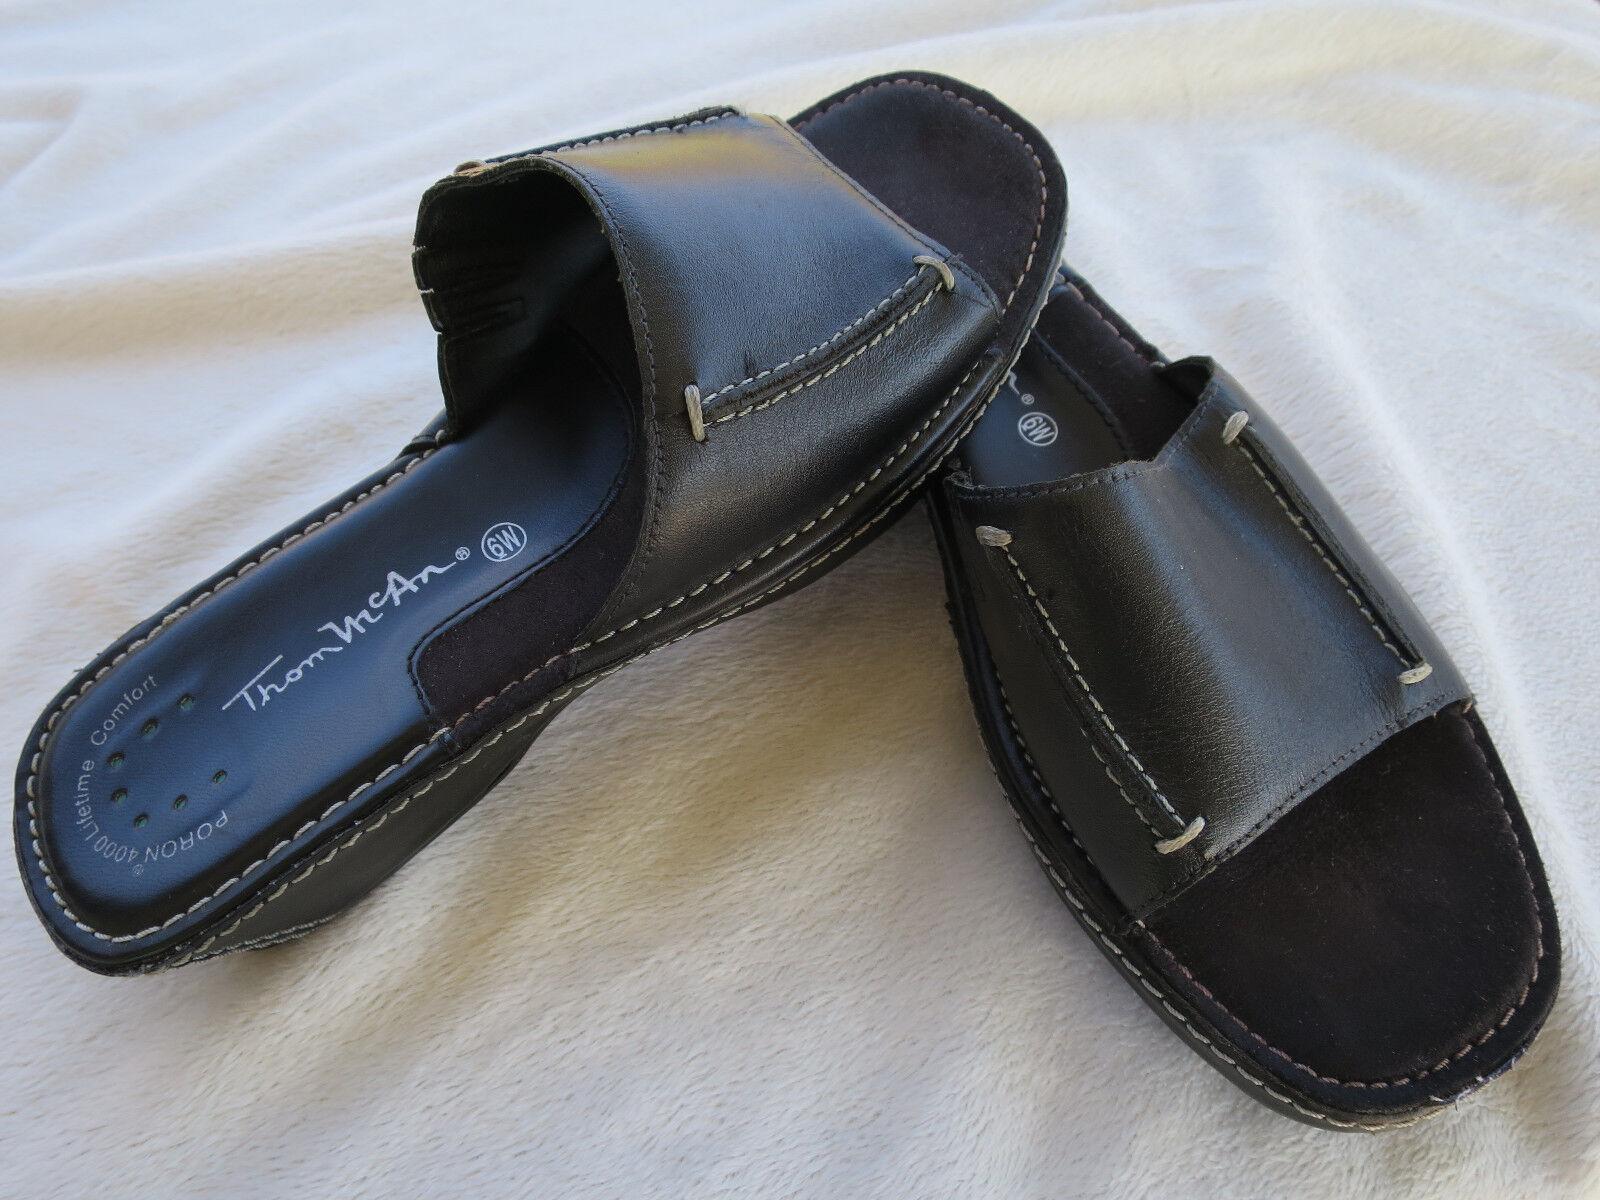 Thom McAn Poron 4000 Comfort Slides Black Leather Slip on Slides Comfort Sandals Shoes Women 6W e3f348